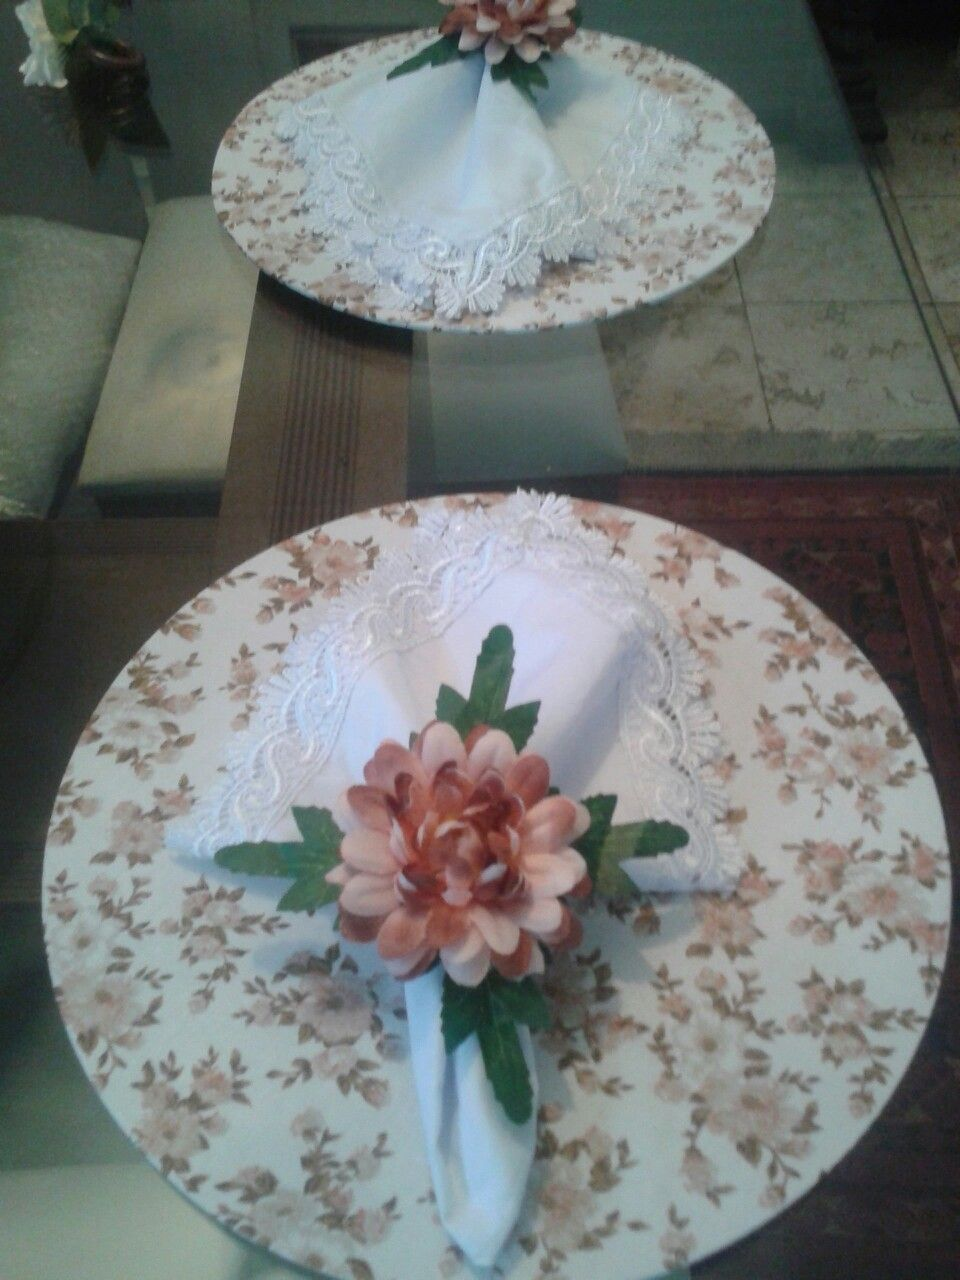 Boa tarde! Com esse belíssimo conjunto floral, capa de sousplat de tricoline, guatdanapo com guipir e PG de Crisântemo.  Instagram→ styloemmesa